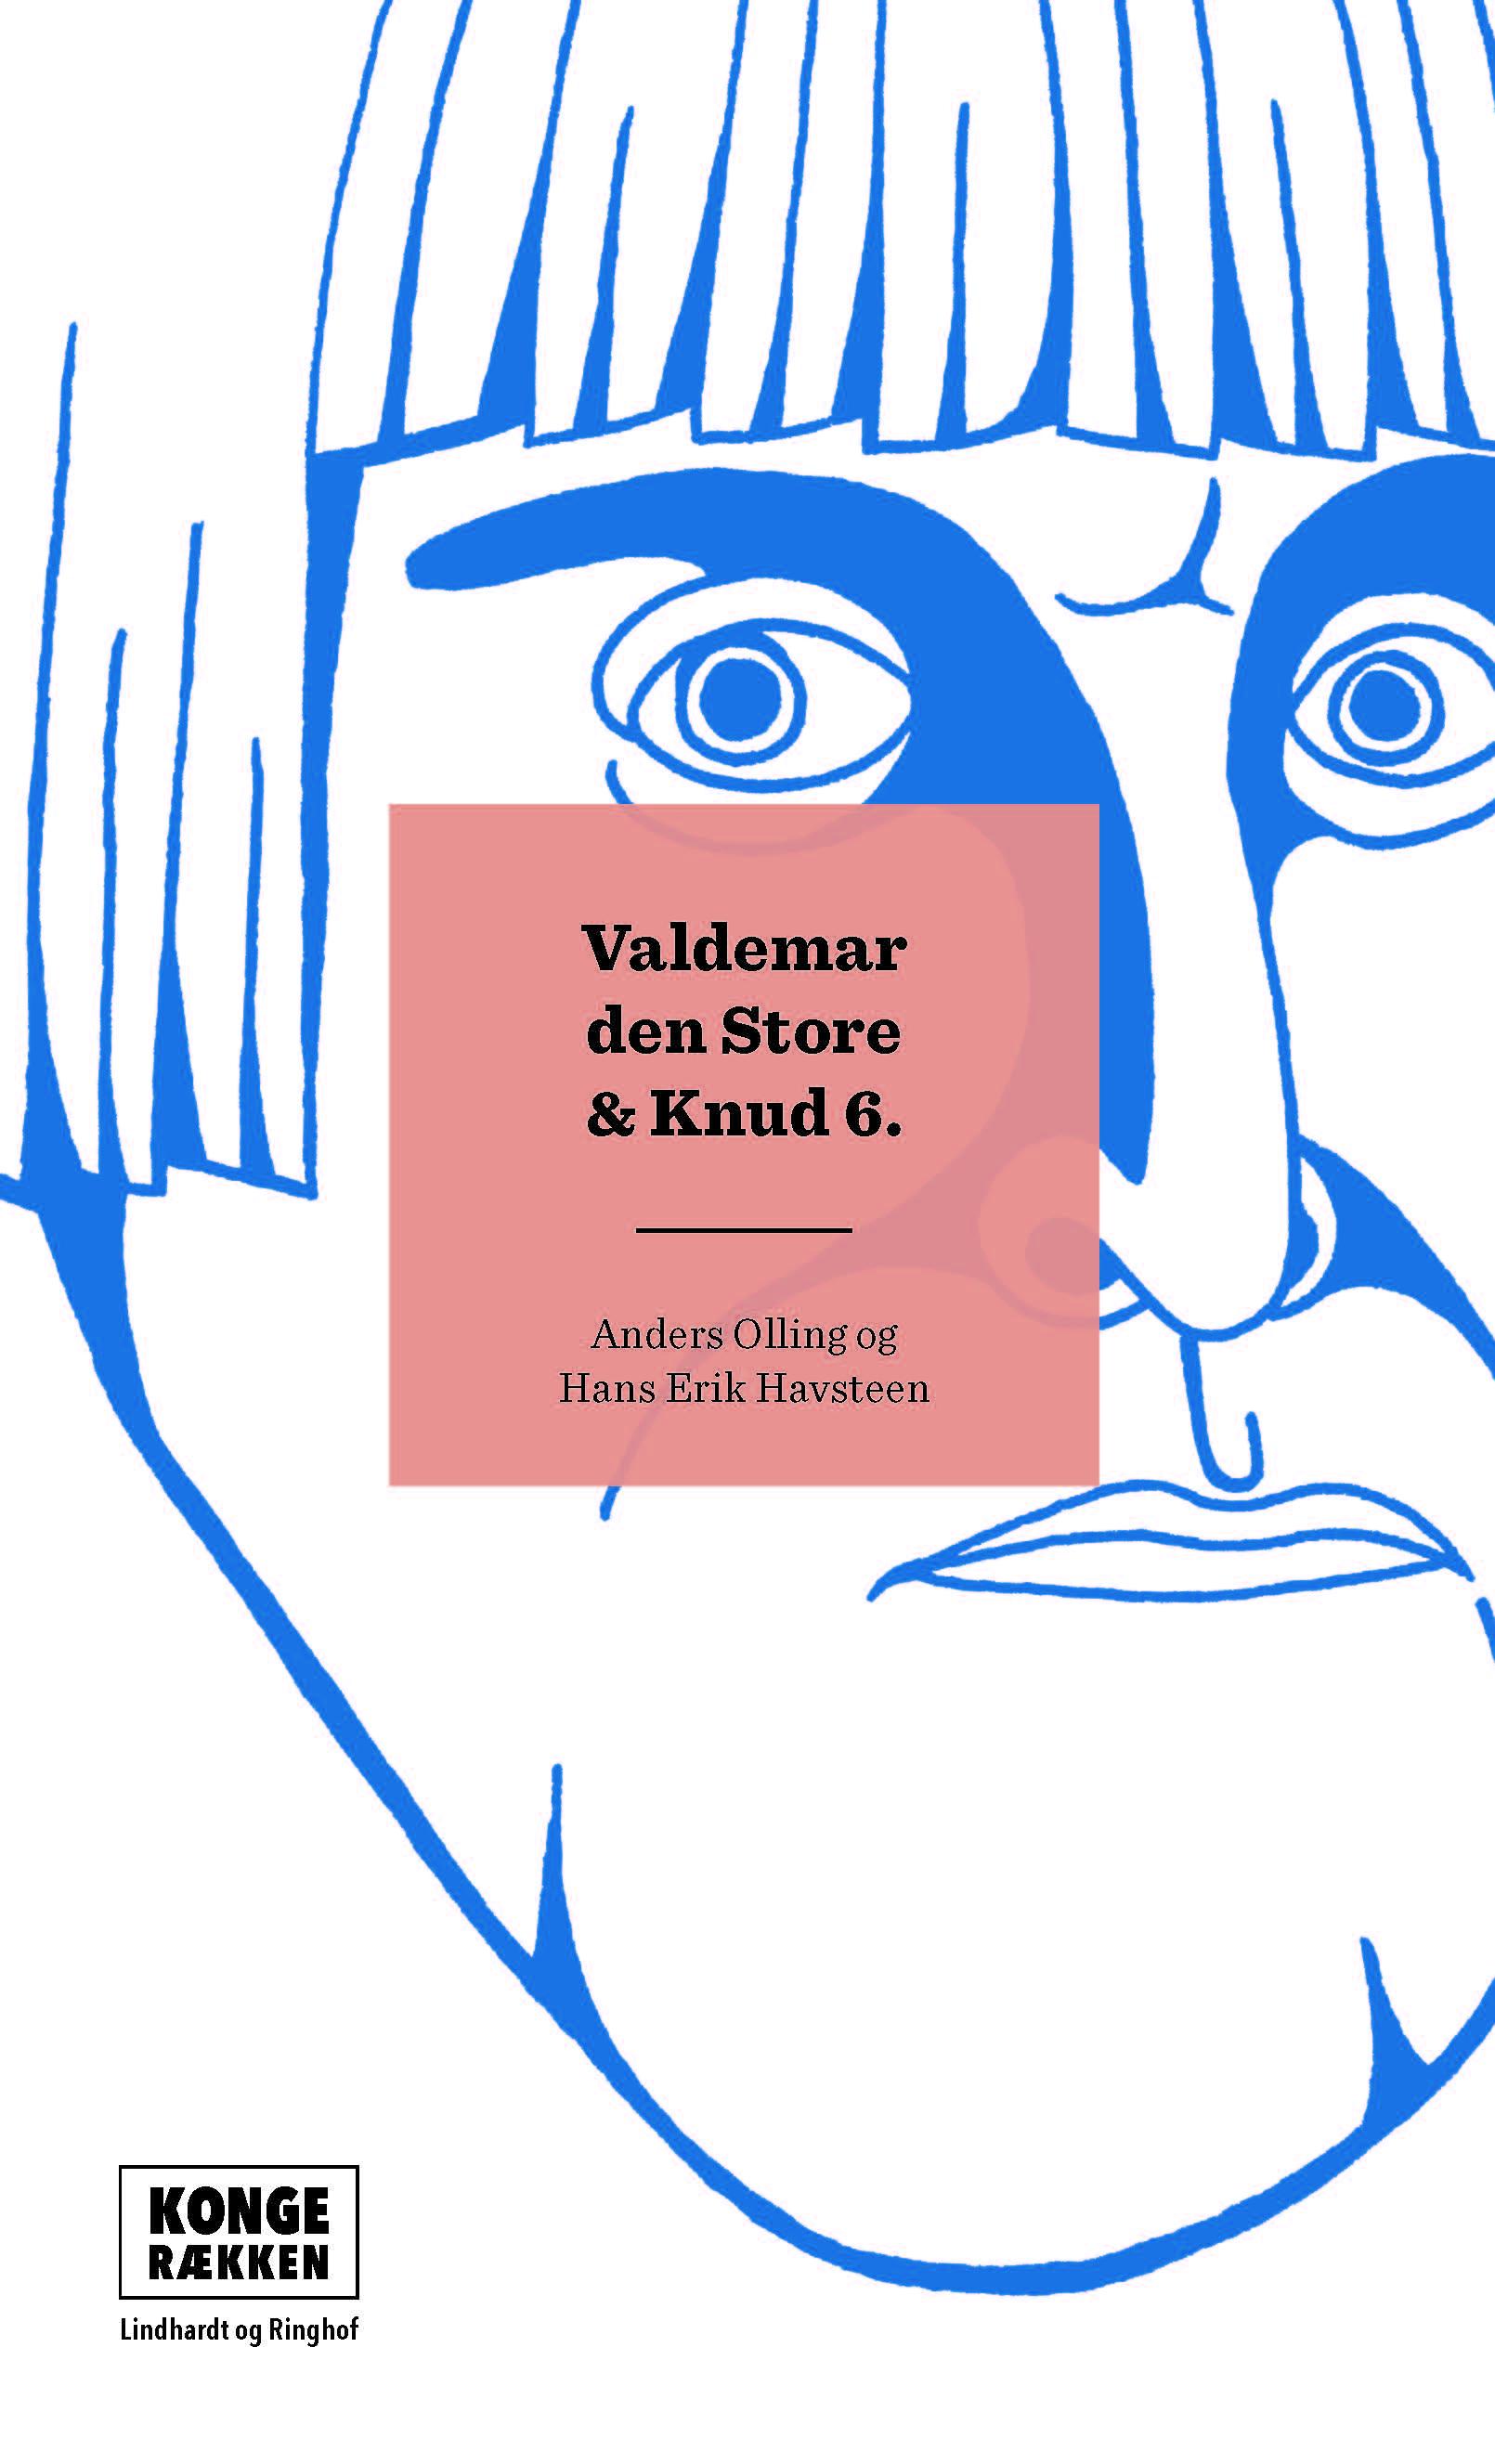 Kongerækken: Valdemar Den Store & Knud 6.   9788711568071   Lindhardt og Ringhof